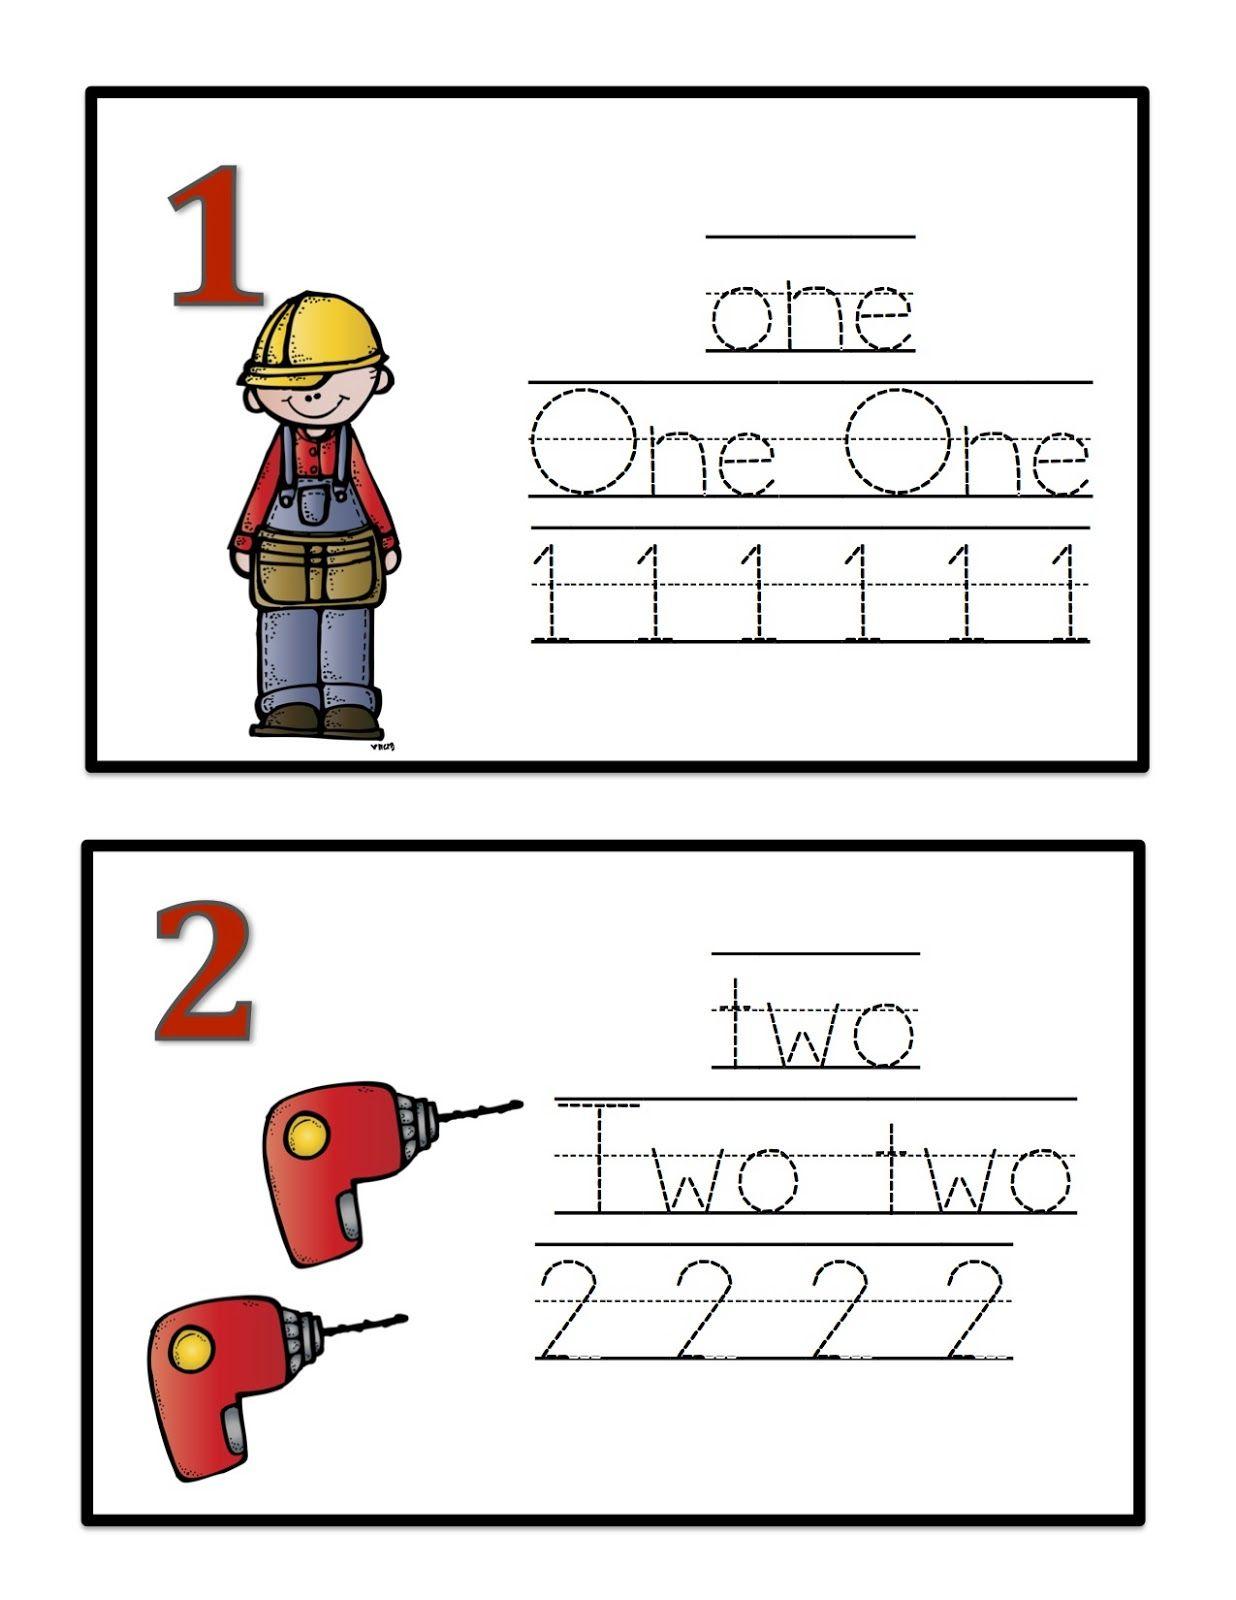 Tools Number Cards Preschool Printables Number cards